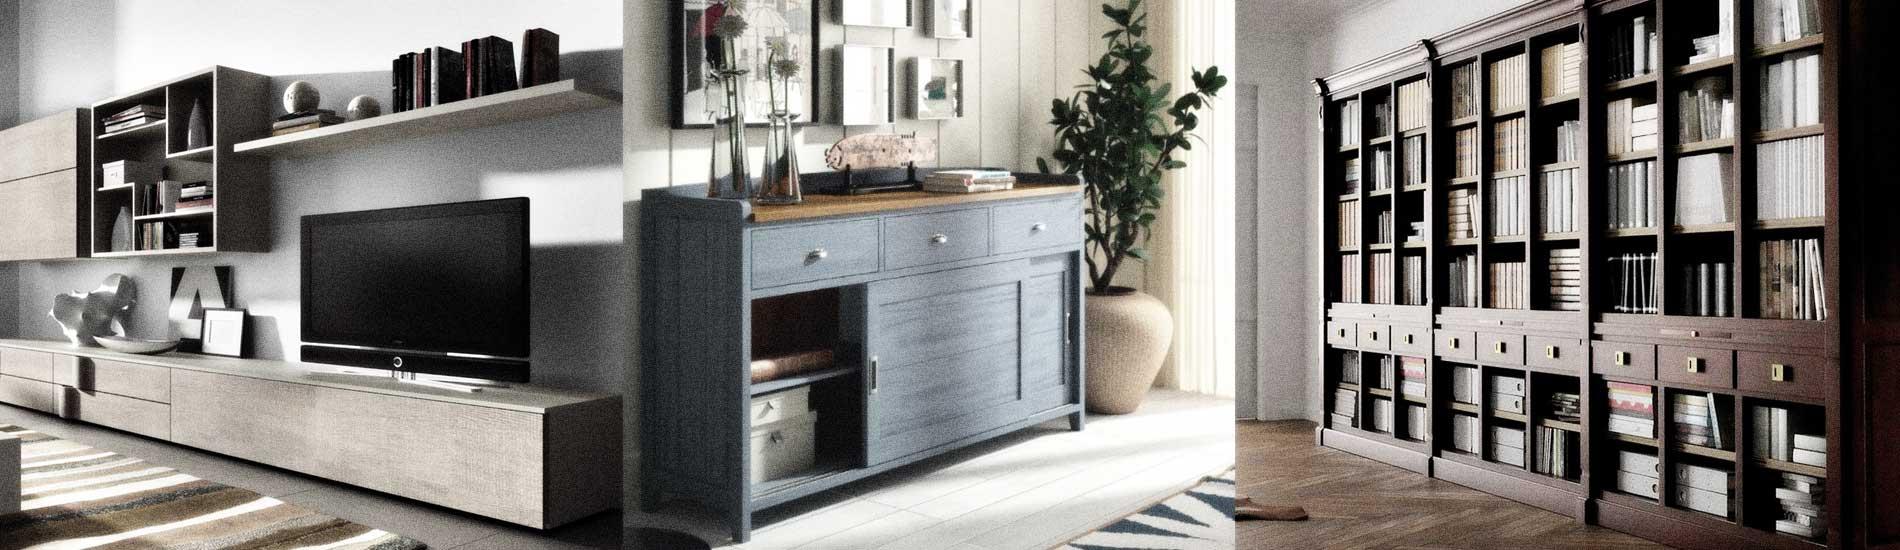 Muebles a medida en madera